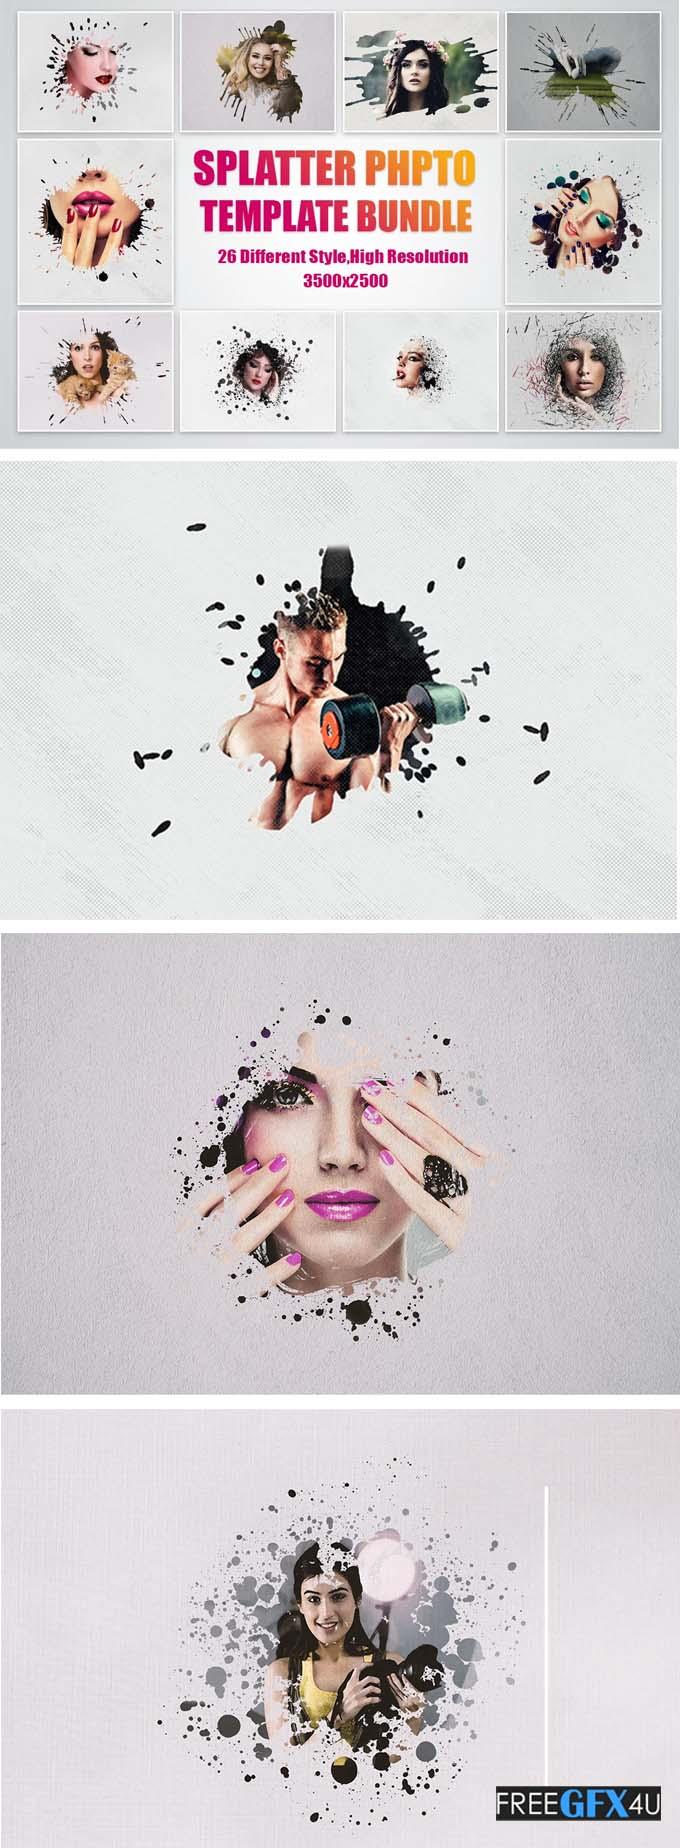 Splatter Photo Template Pack